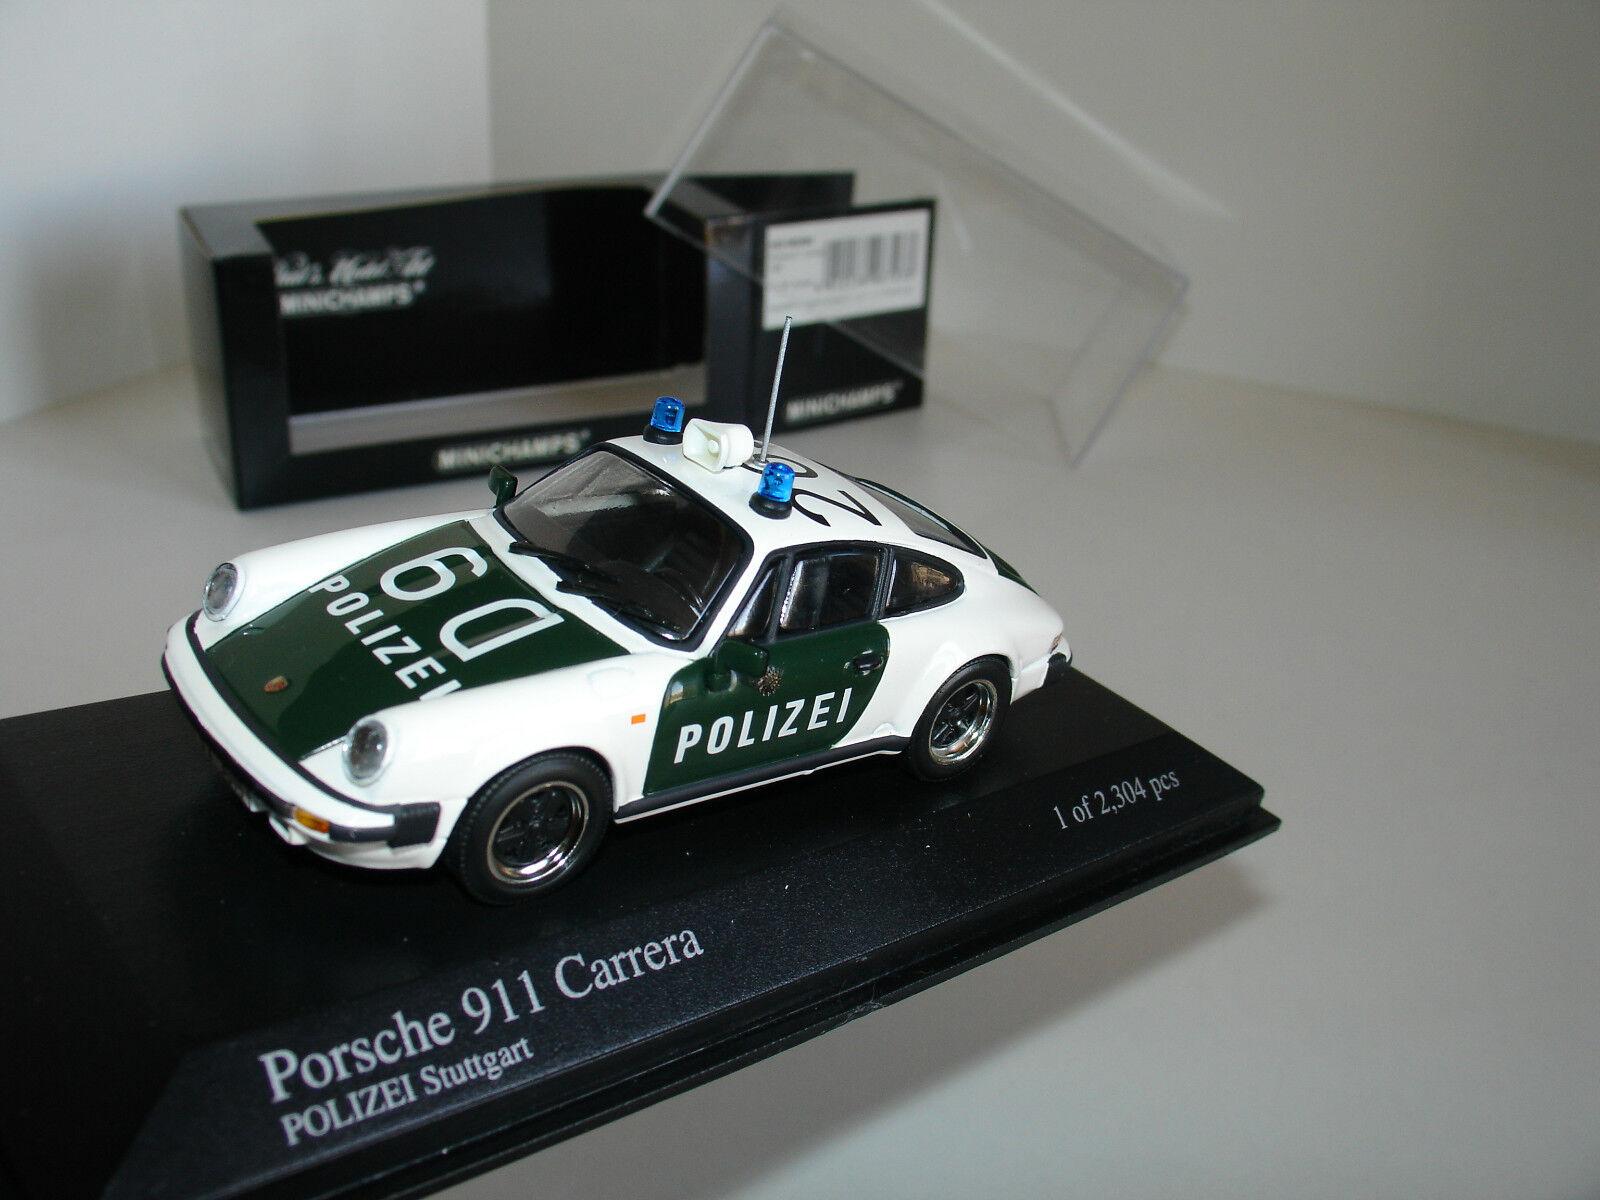 1 43 PORSCHE 911 CARRERA 1983 POLIZEI STUTTGART by MINICHAMPS